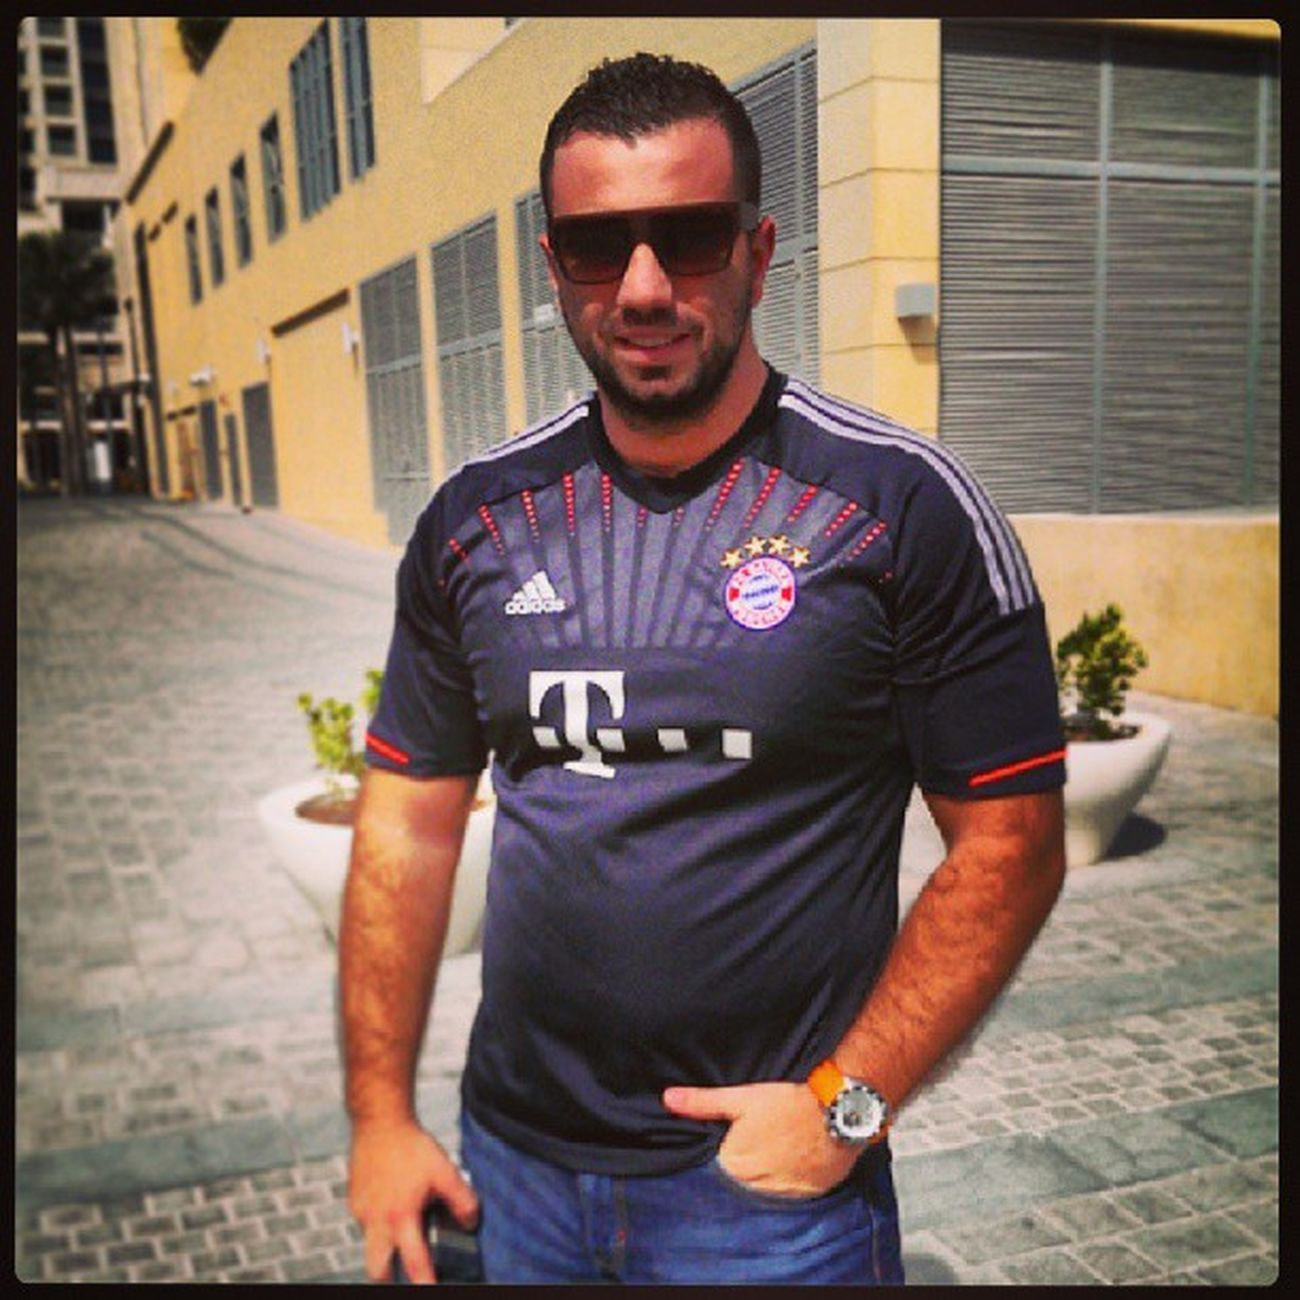 ready for the UEFA Supercup . Let's go FCBAYERNMÜNCHEN Dubai